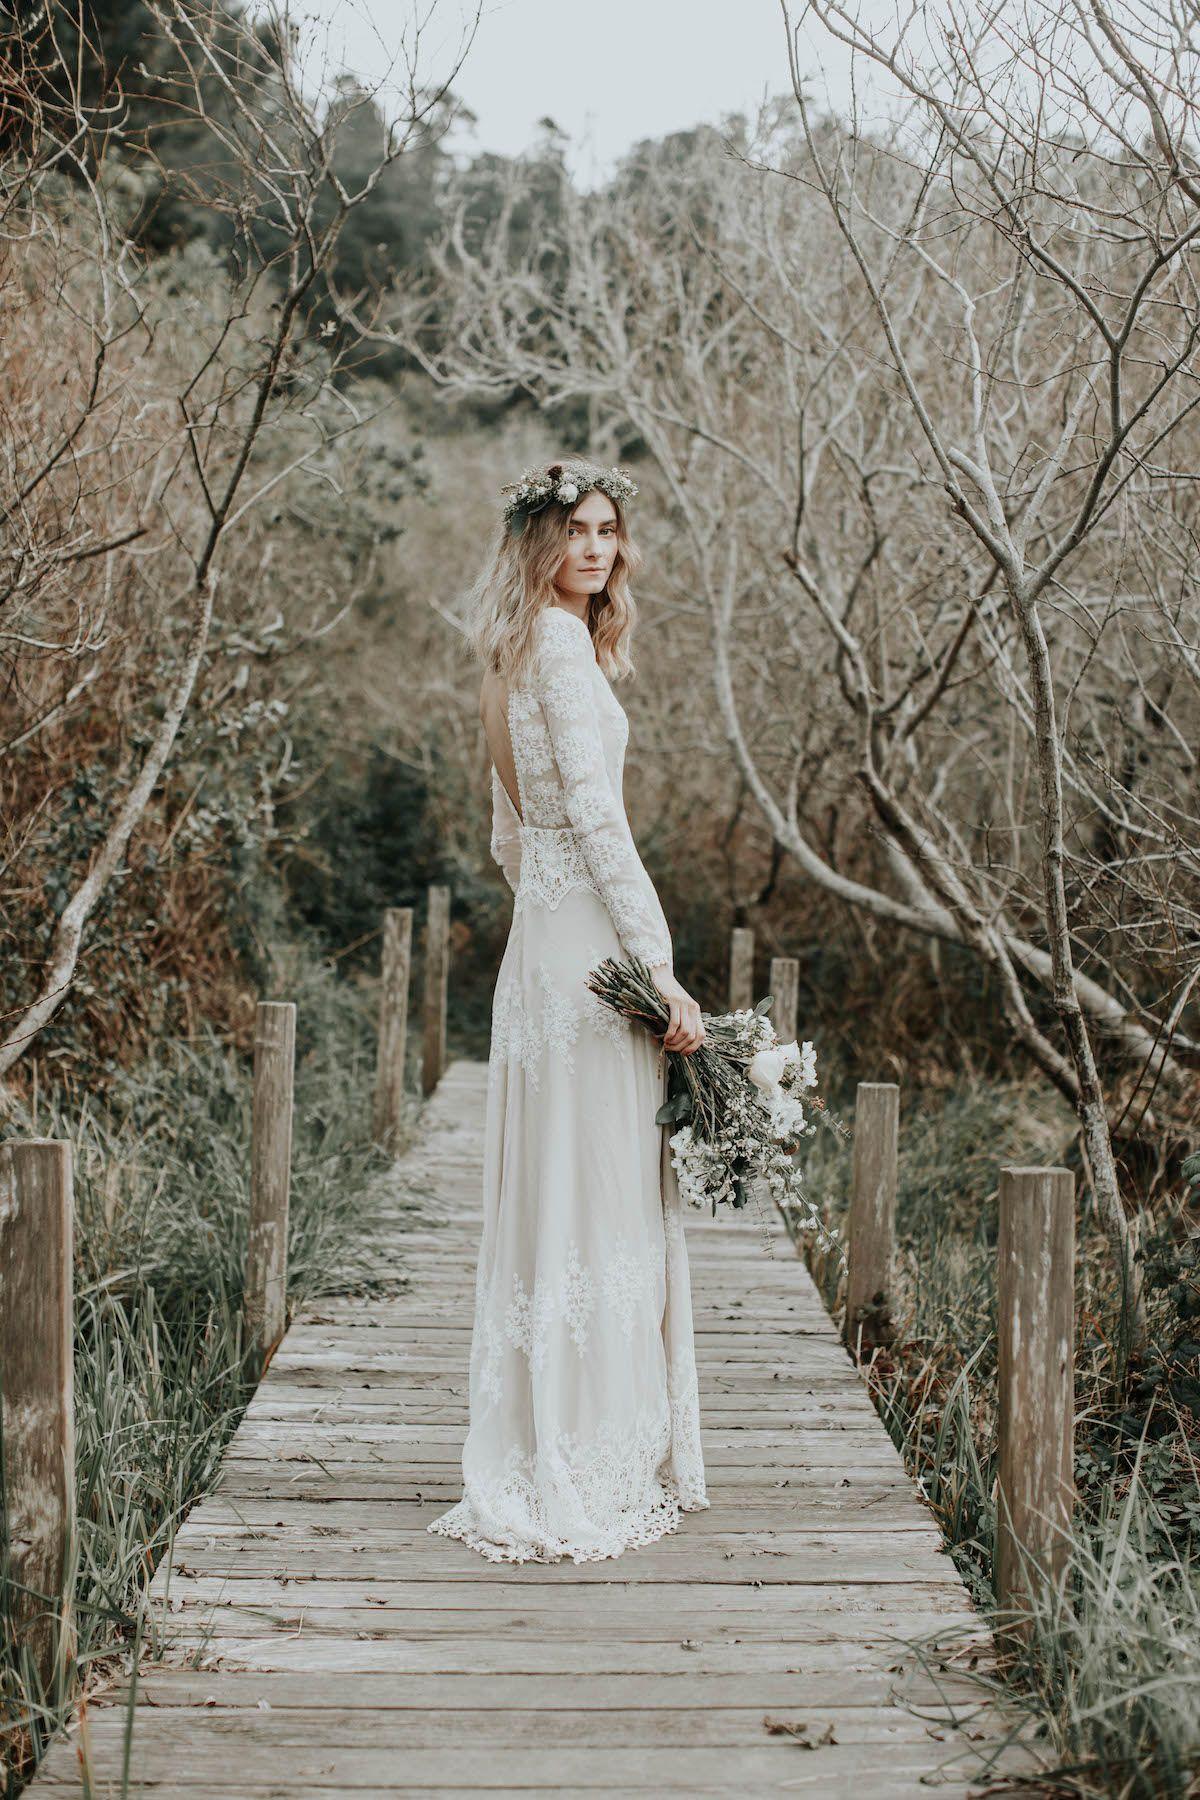 Lisa Lace Wedding Dress Garden Wedding Dresses Boho Wedding Dress Lace Wedding Dresses Lace